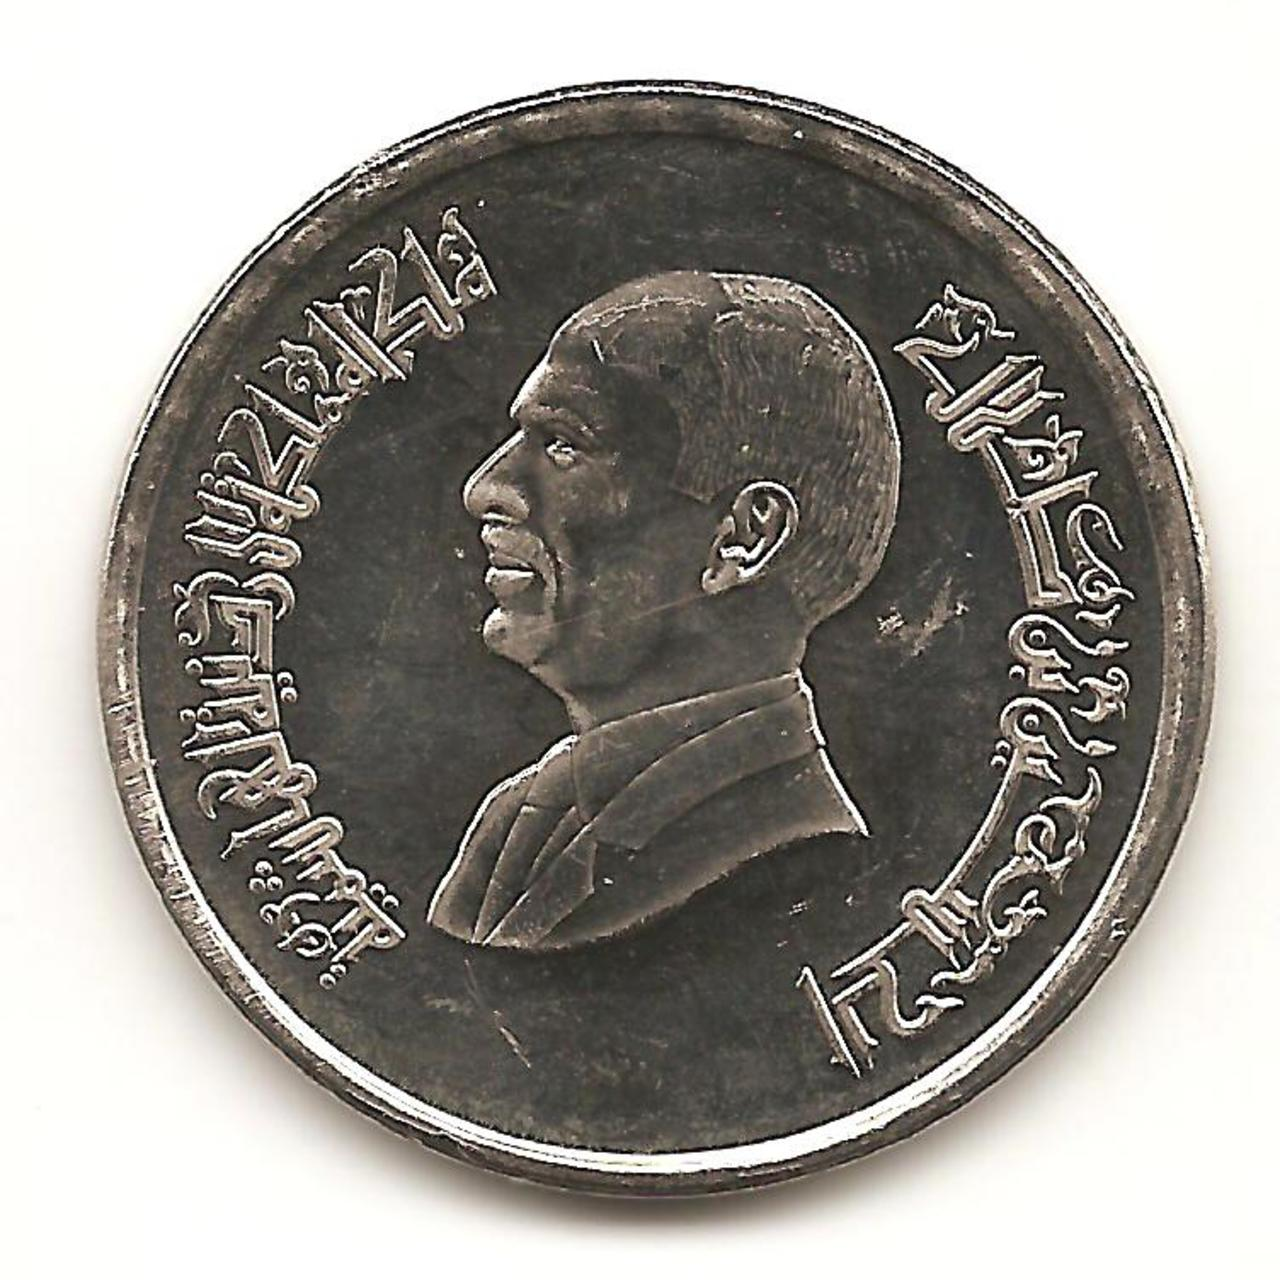 10 piastras de 1997 Jordania Image